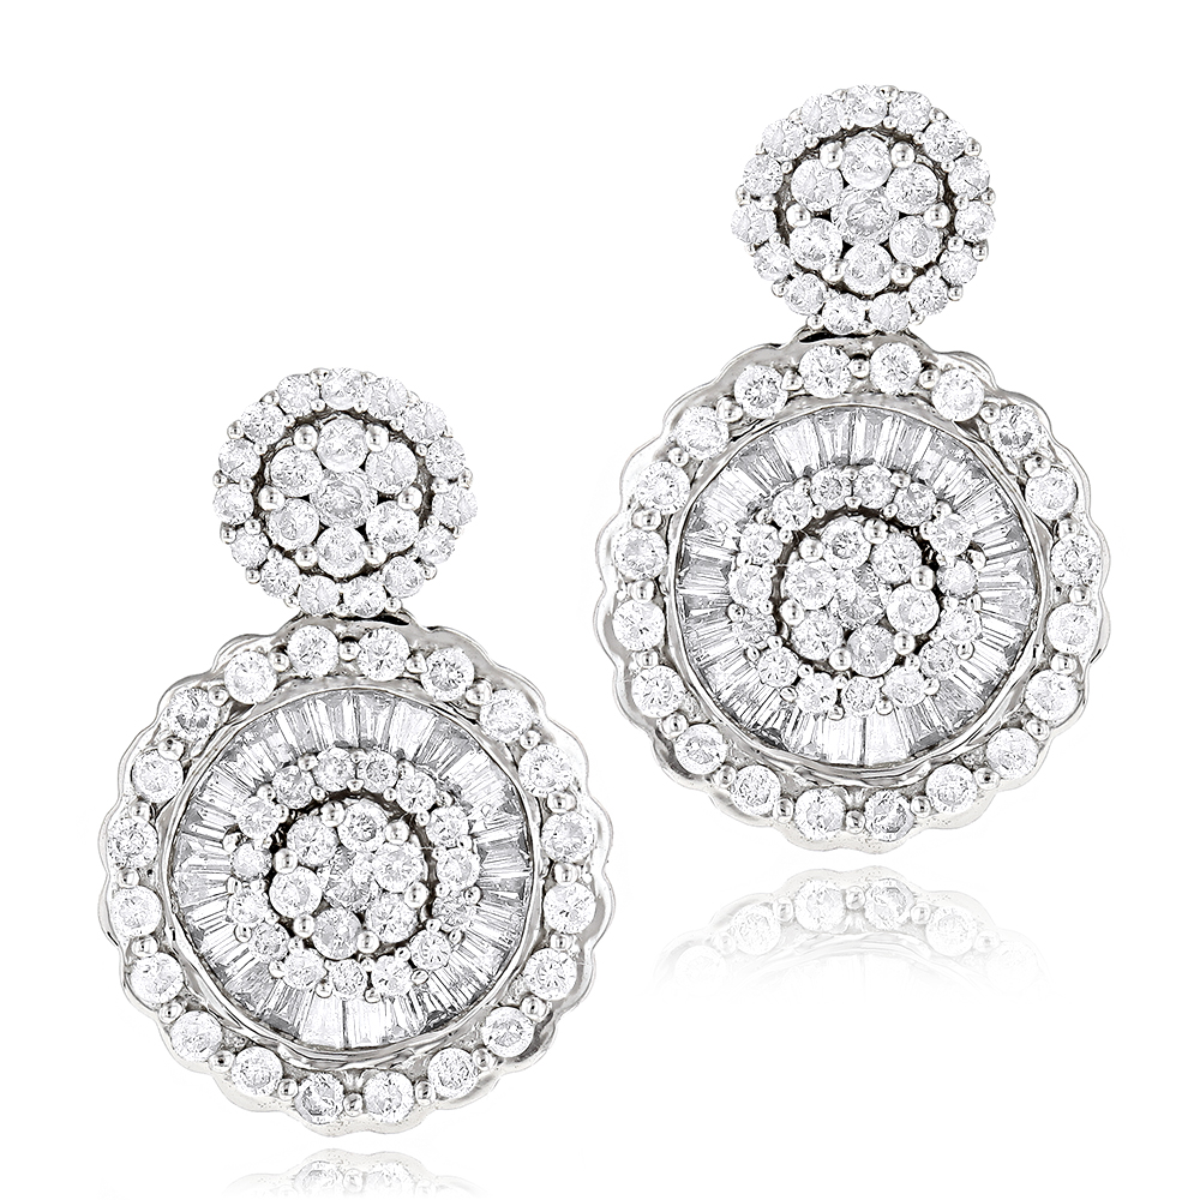 Ladies 18K Gold Designer Diamond Earrings 1.78ct